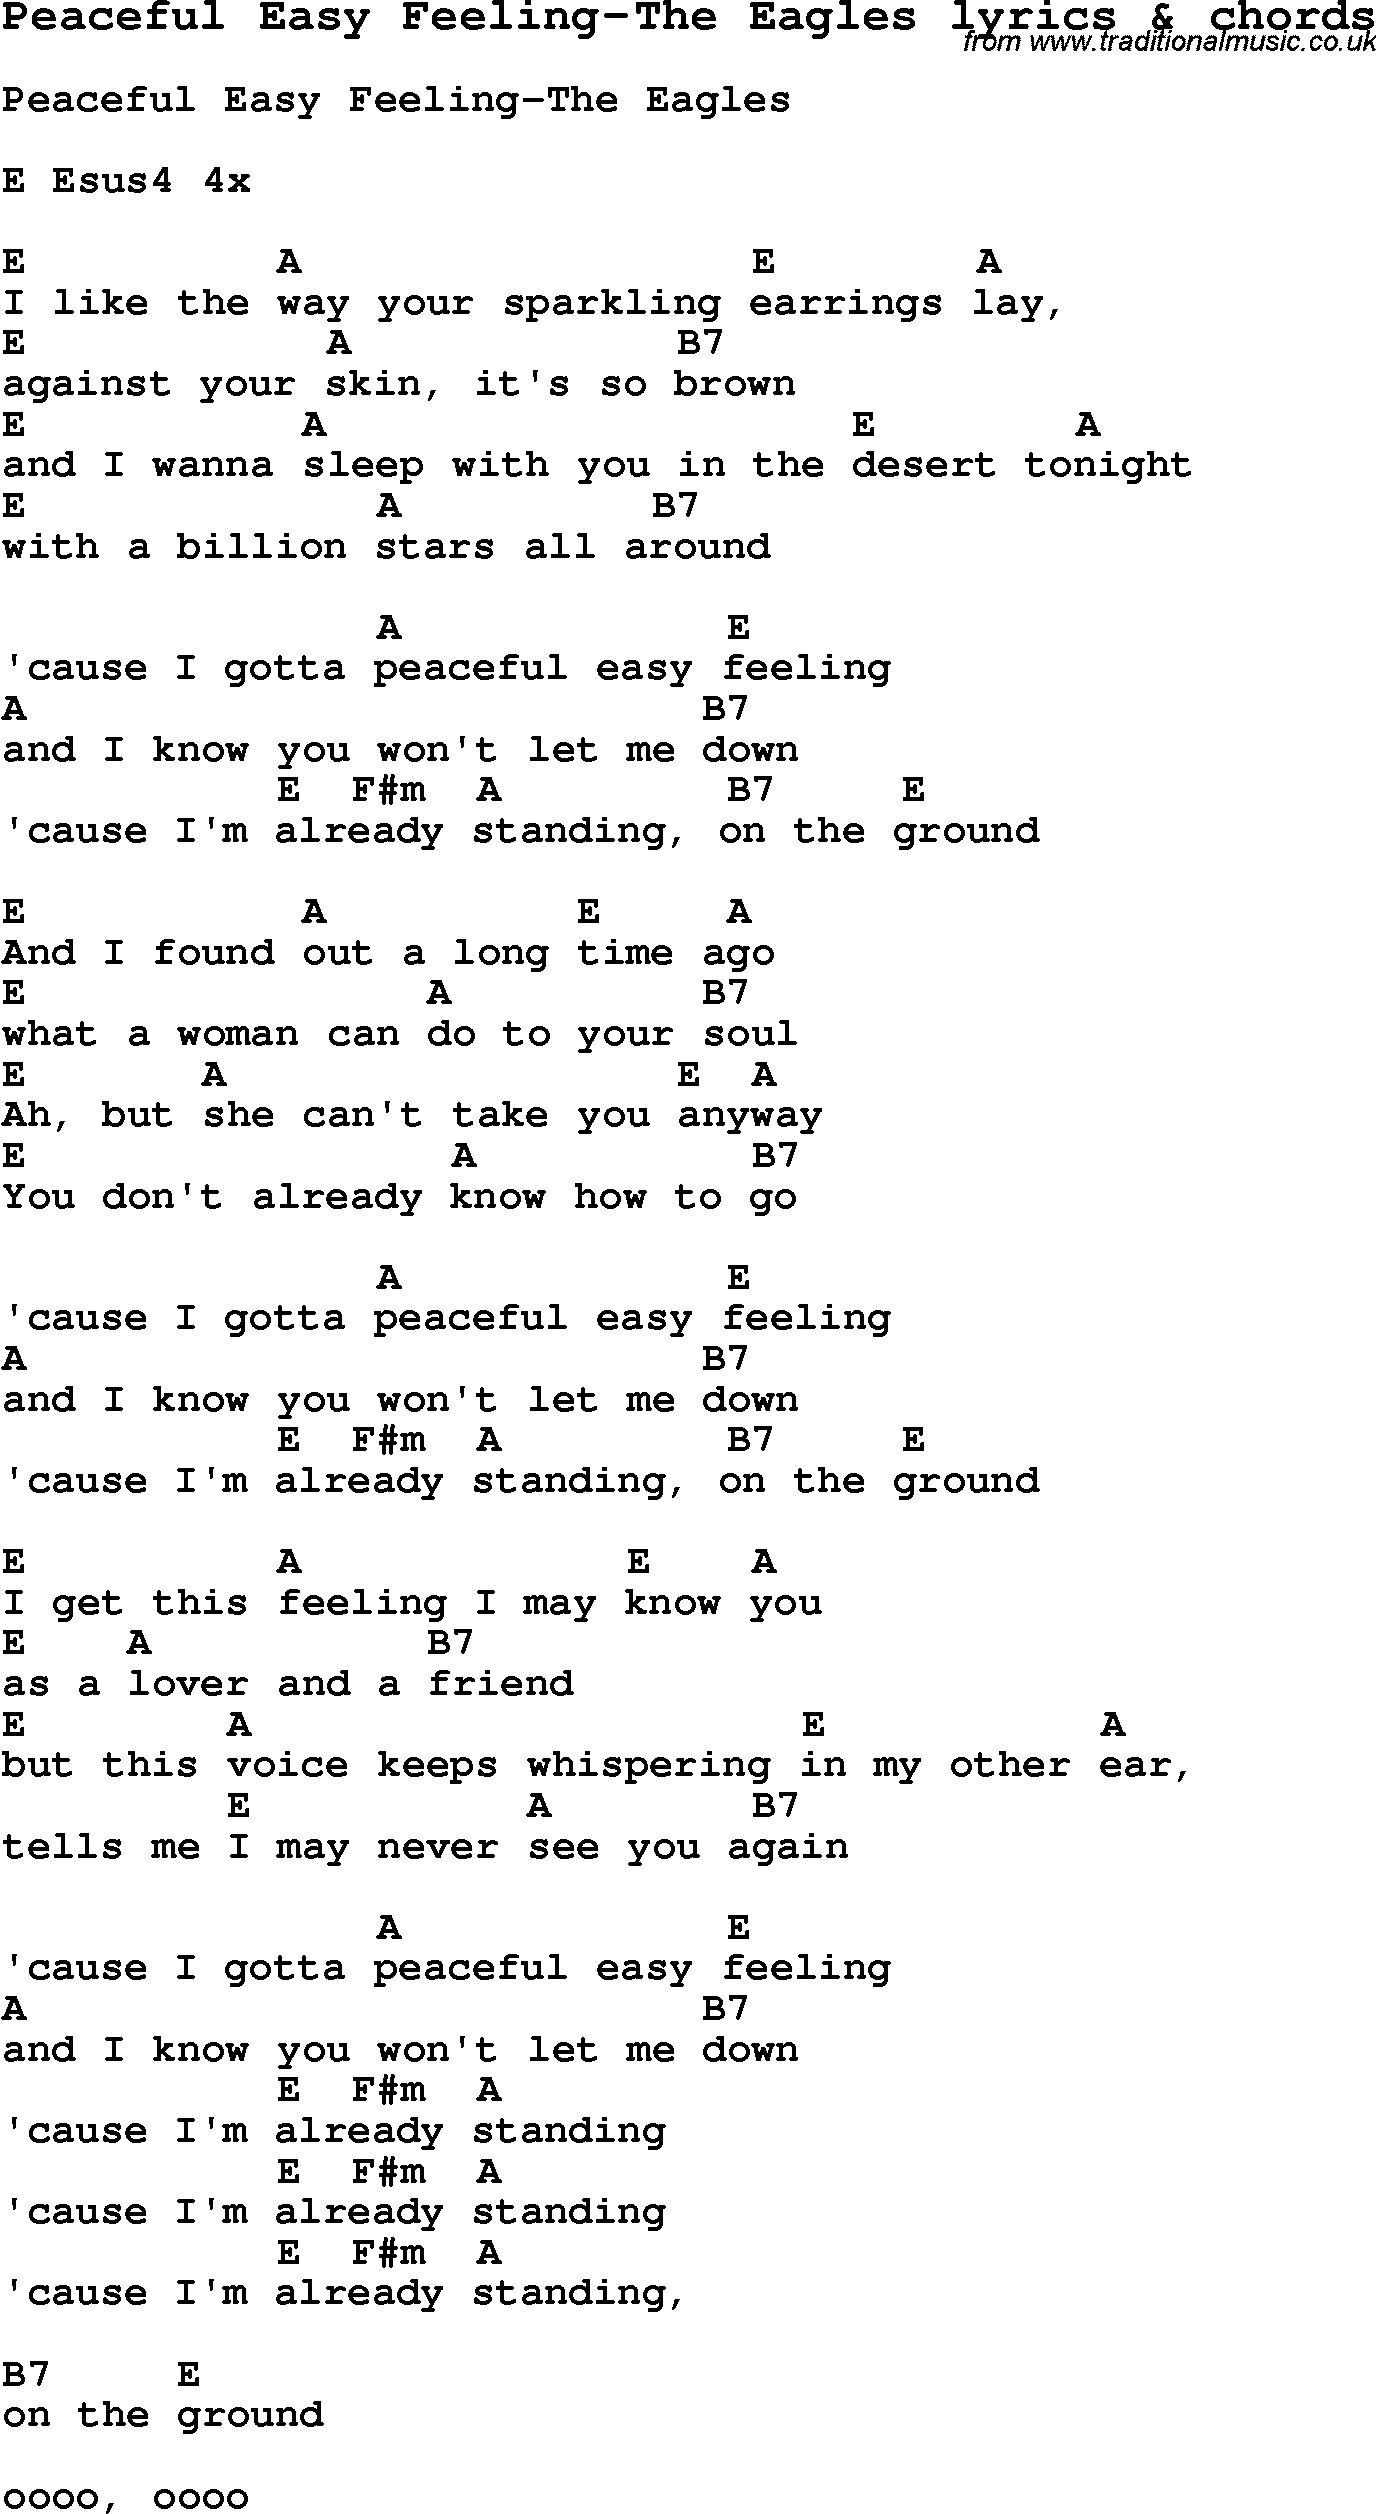 Peaceful Easy Feeling Chords Love Song Lyrics Forpeaceful Easy Feeling The Eagles With Chords